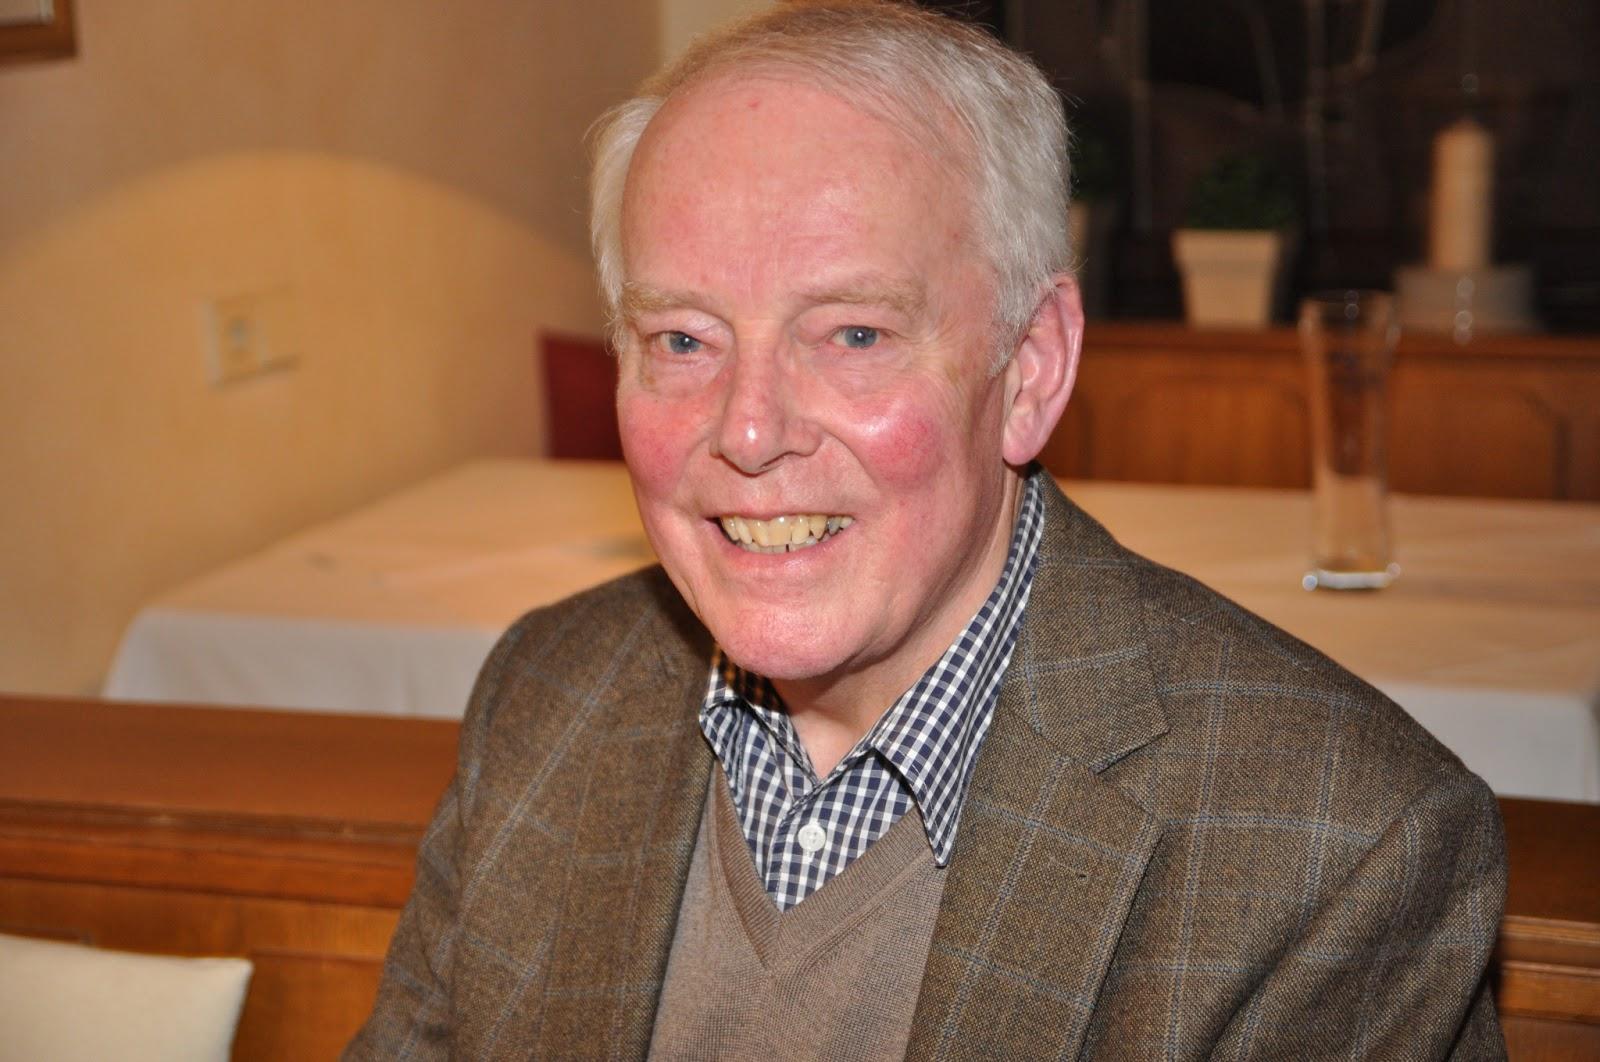 Bernd Sievers